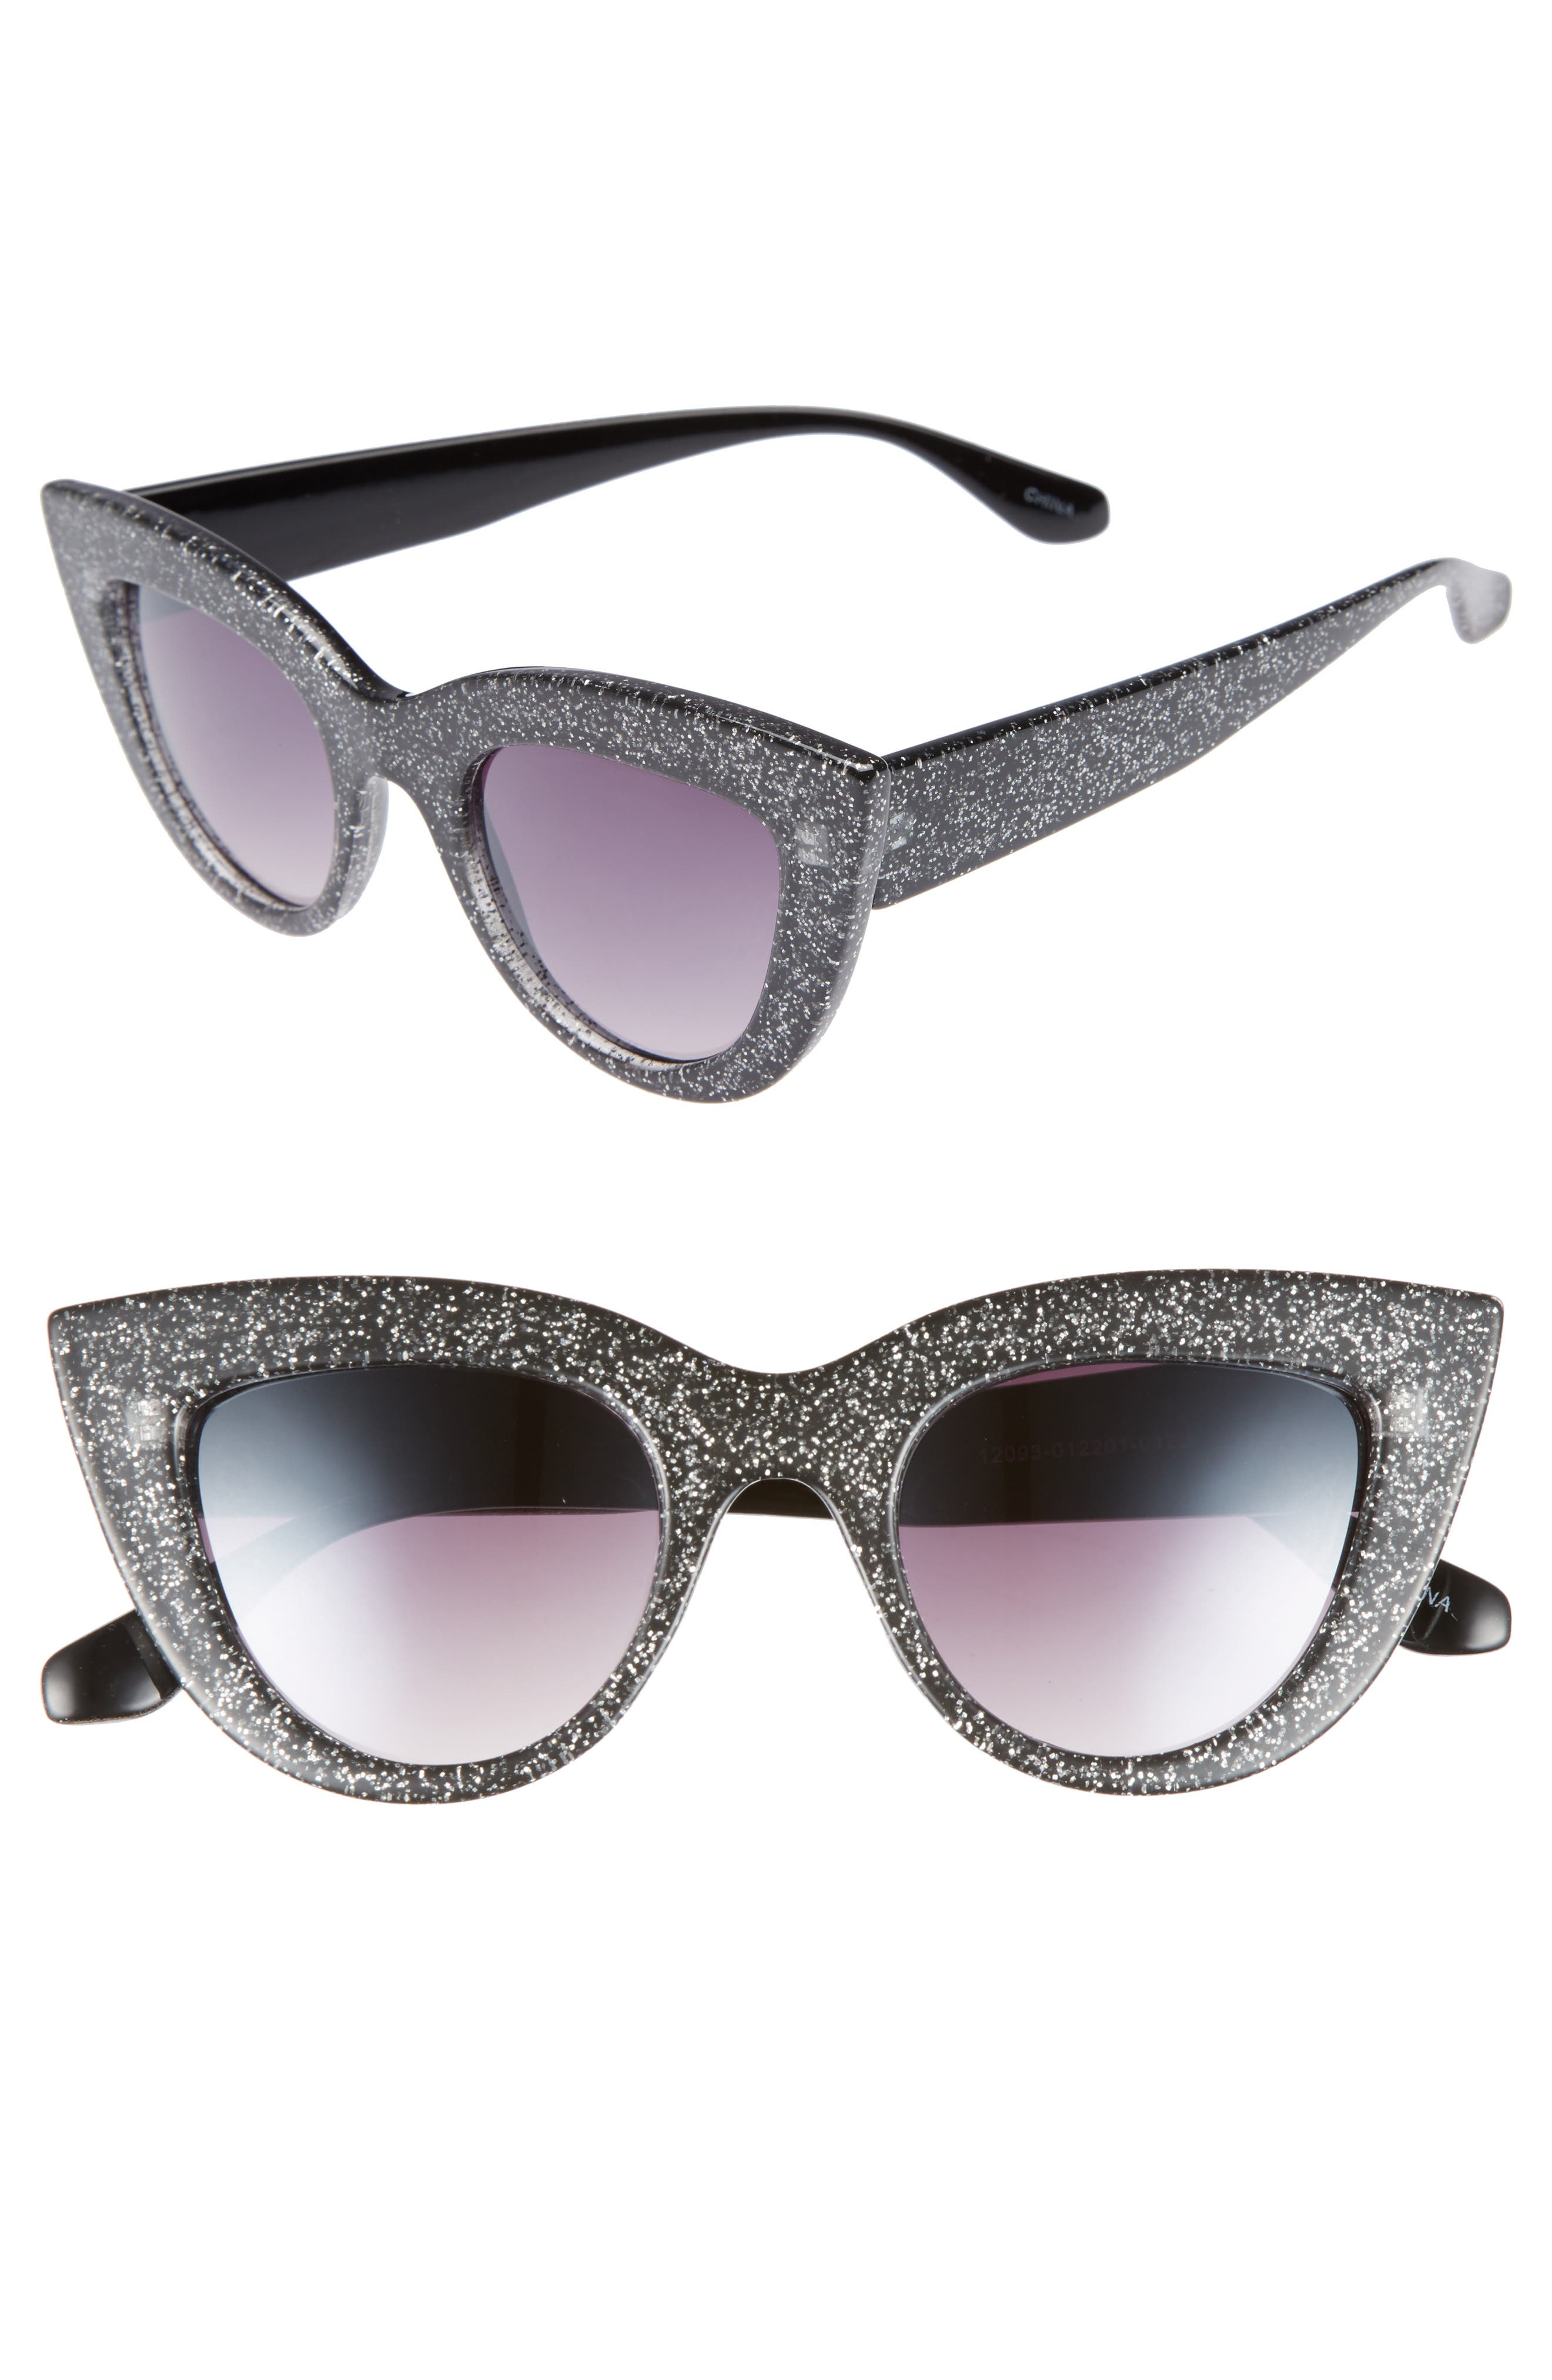 45mm Glitter Cat Eye Sunglasses,                             Main thumbnail 1, color,